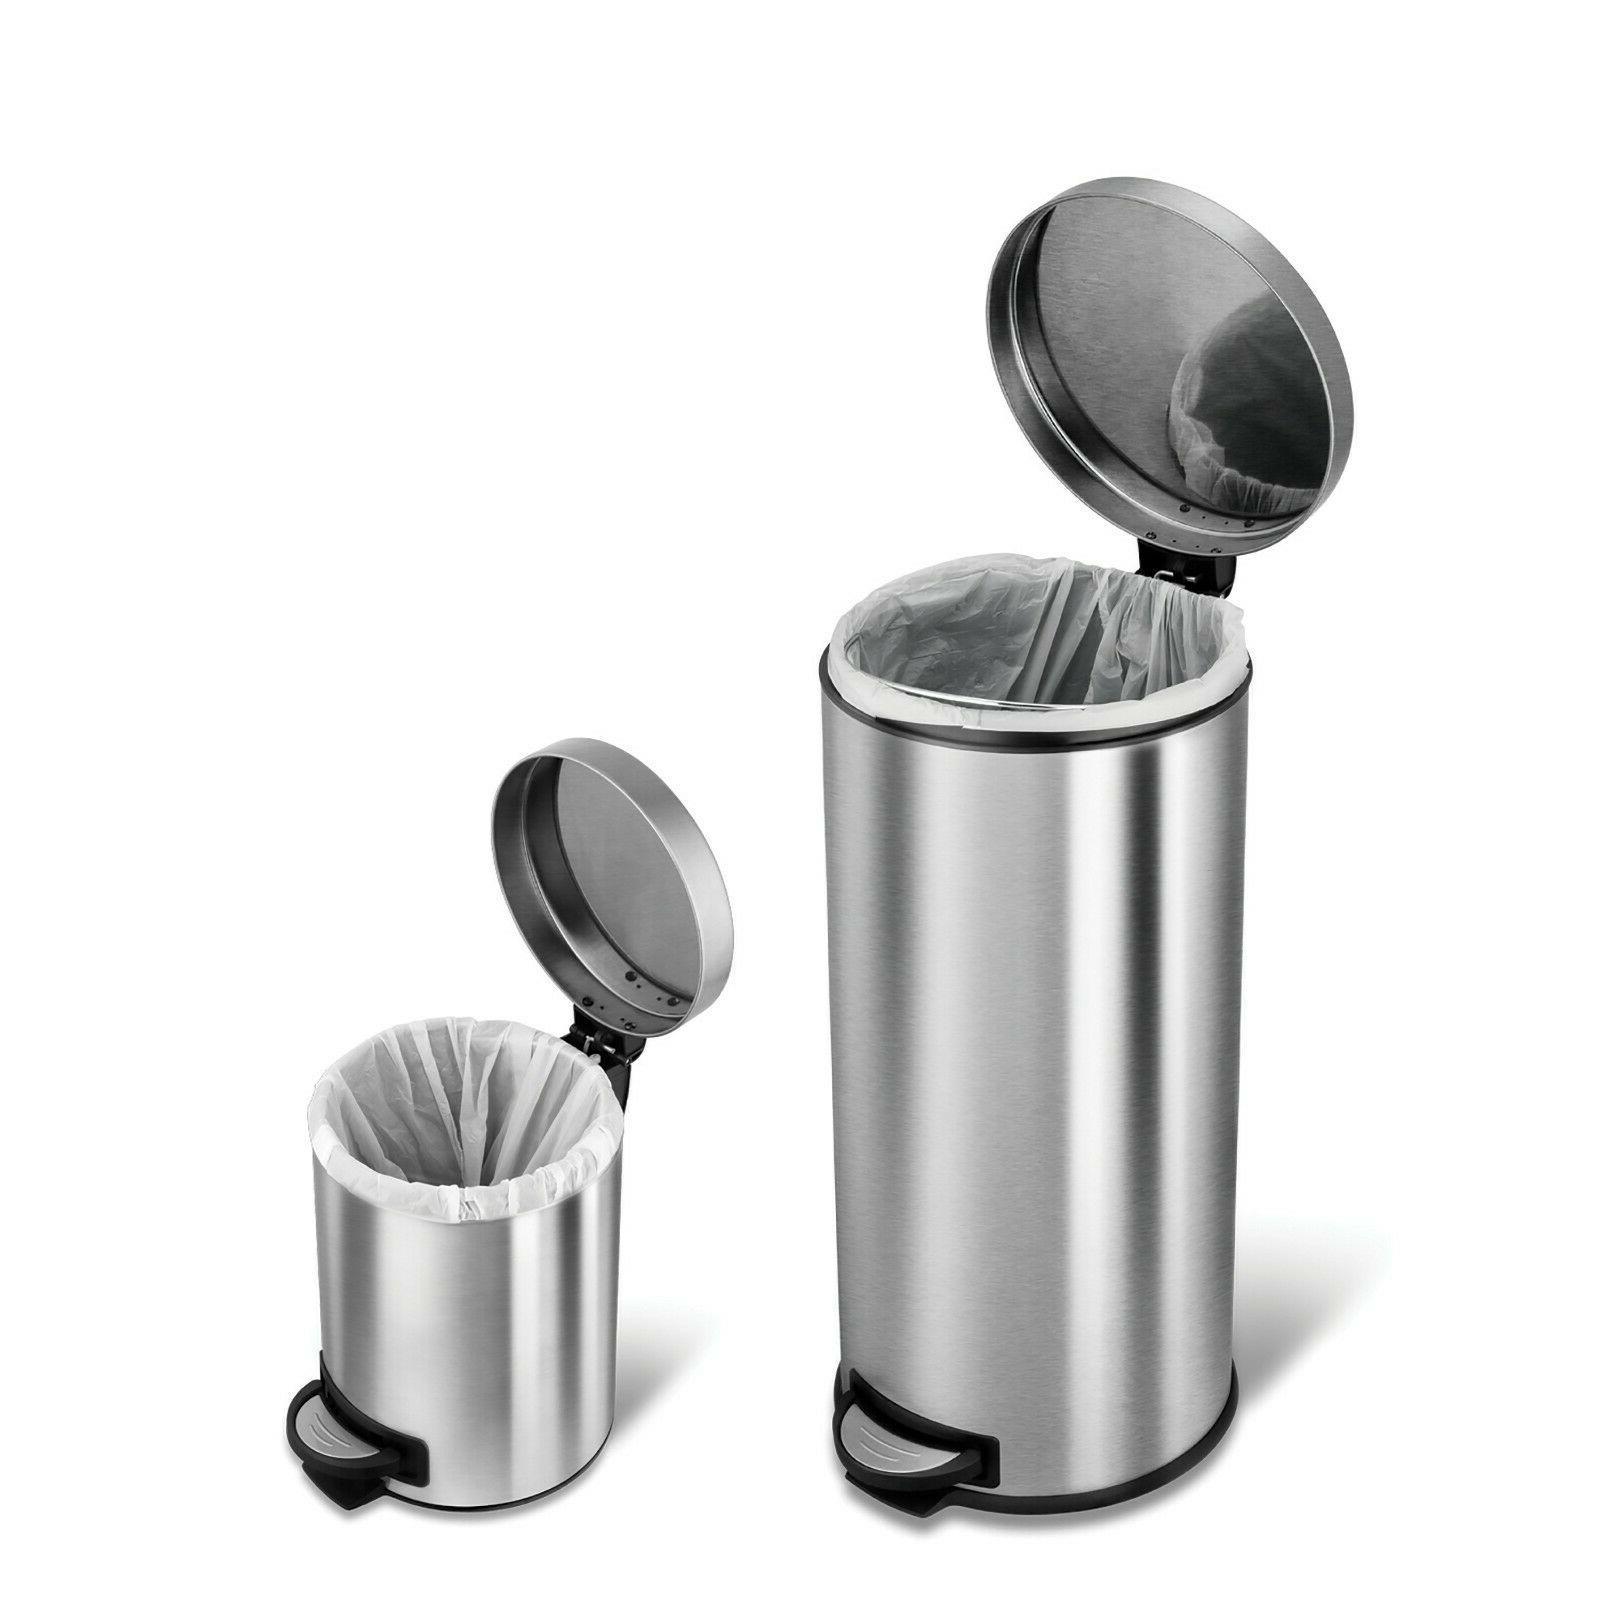 Silver Stainless Steel Step On Bin Waste Kitchen Bag